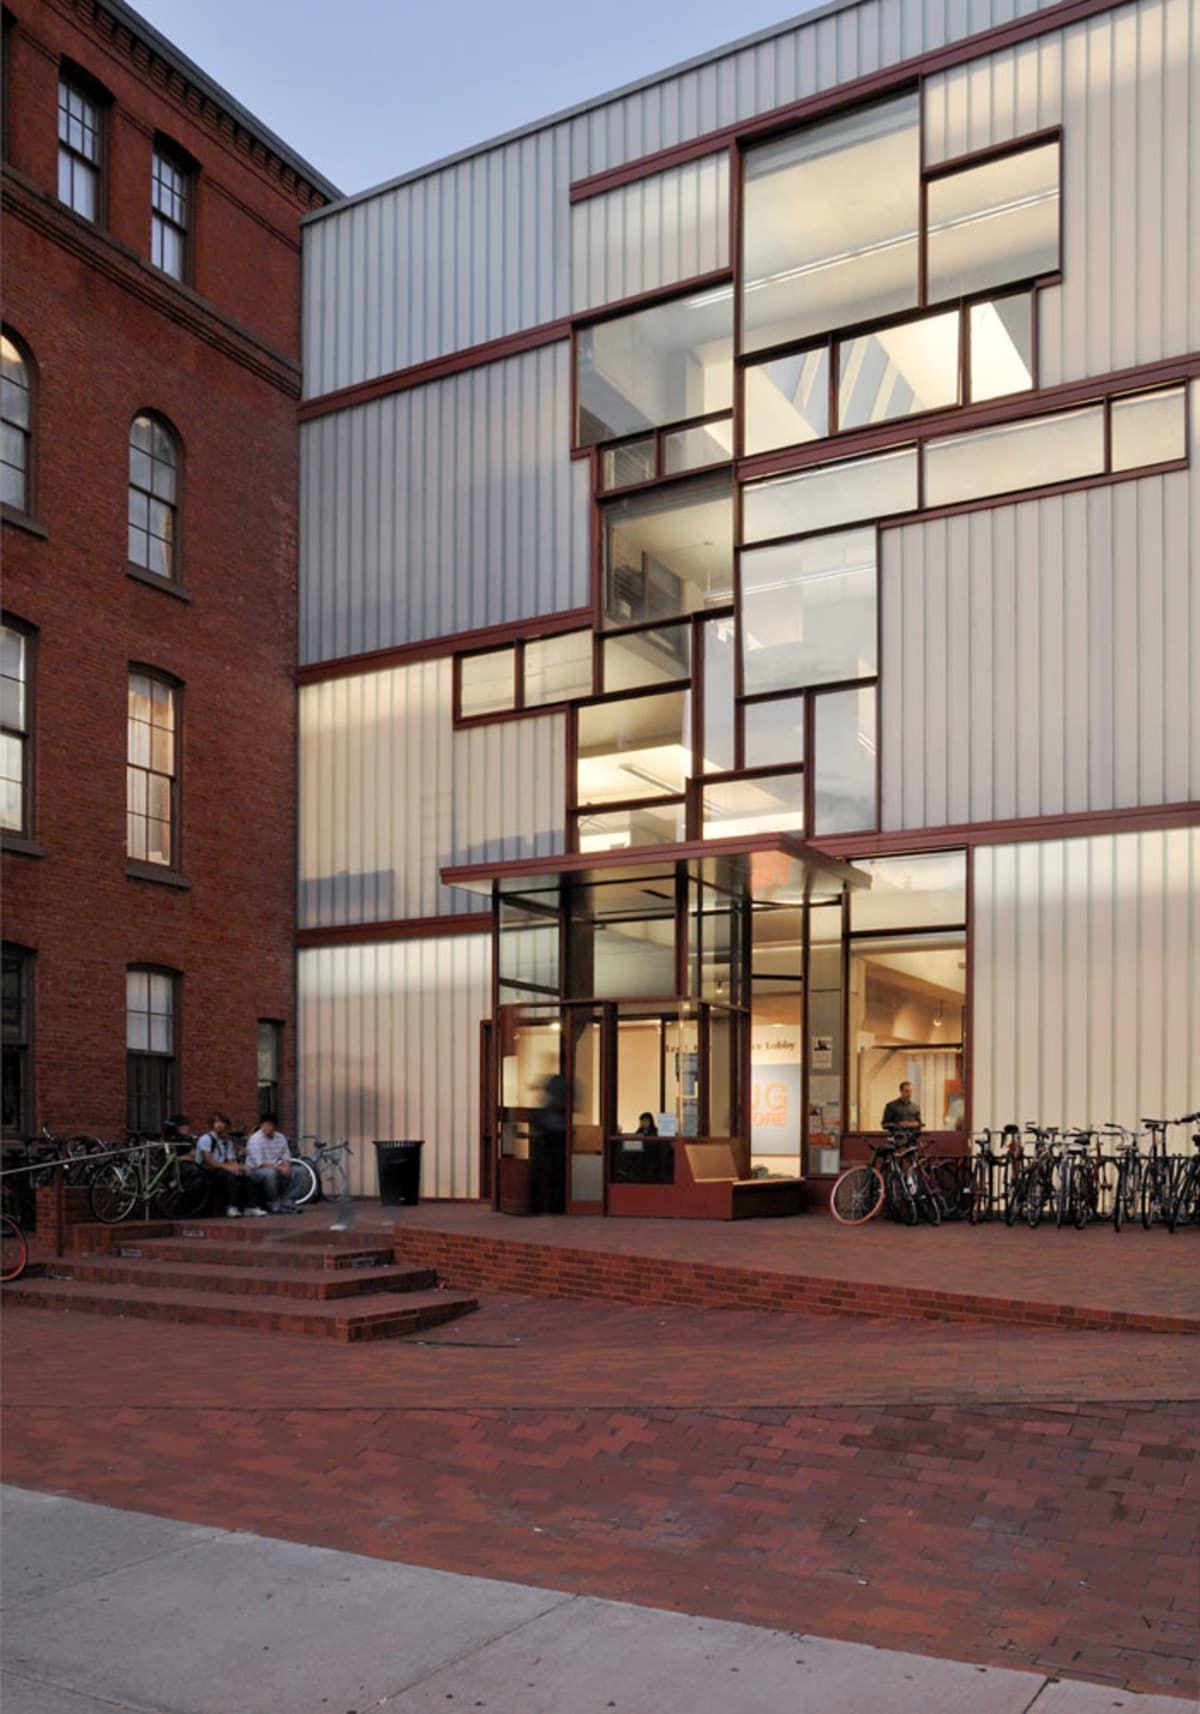 Steven Holl Architects Michele Nastasi Pratt Institute Higgins Hall Insertion Facade Architecture Building Aesthetic Architecture